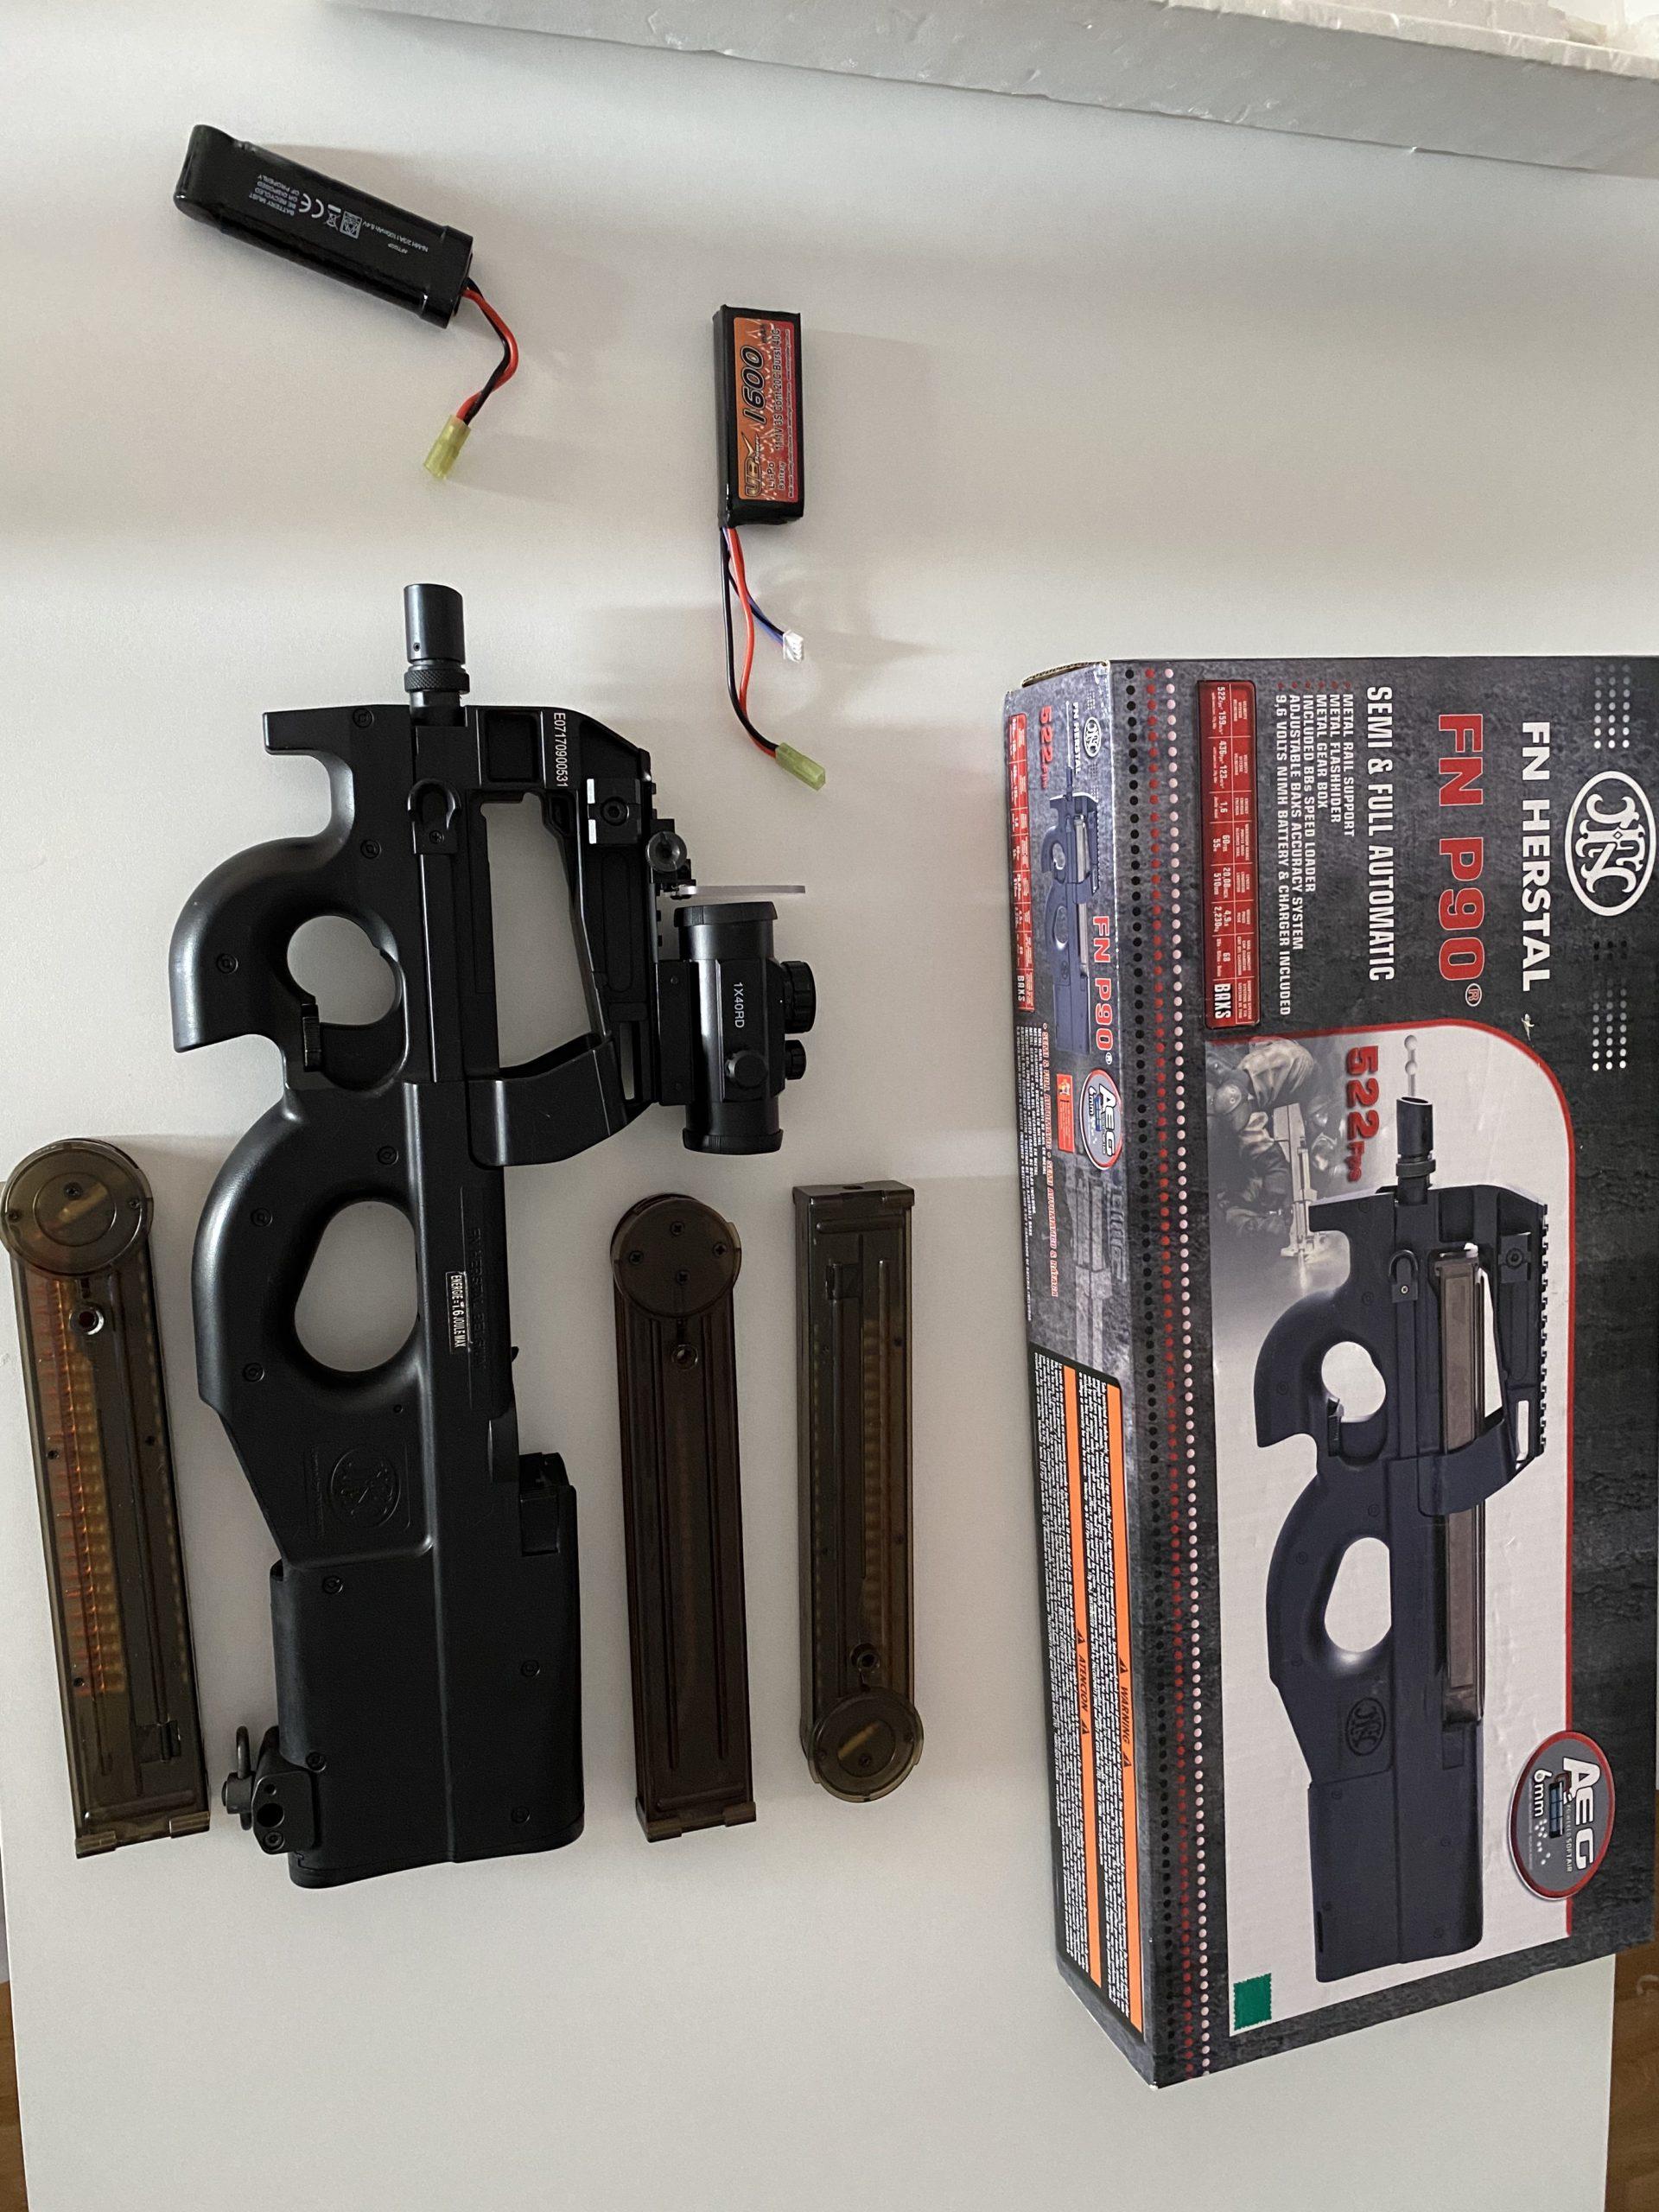 P90 FN HERSTAL